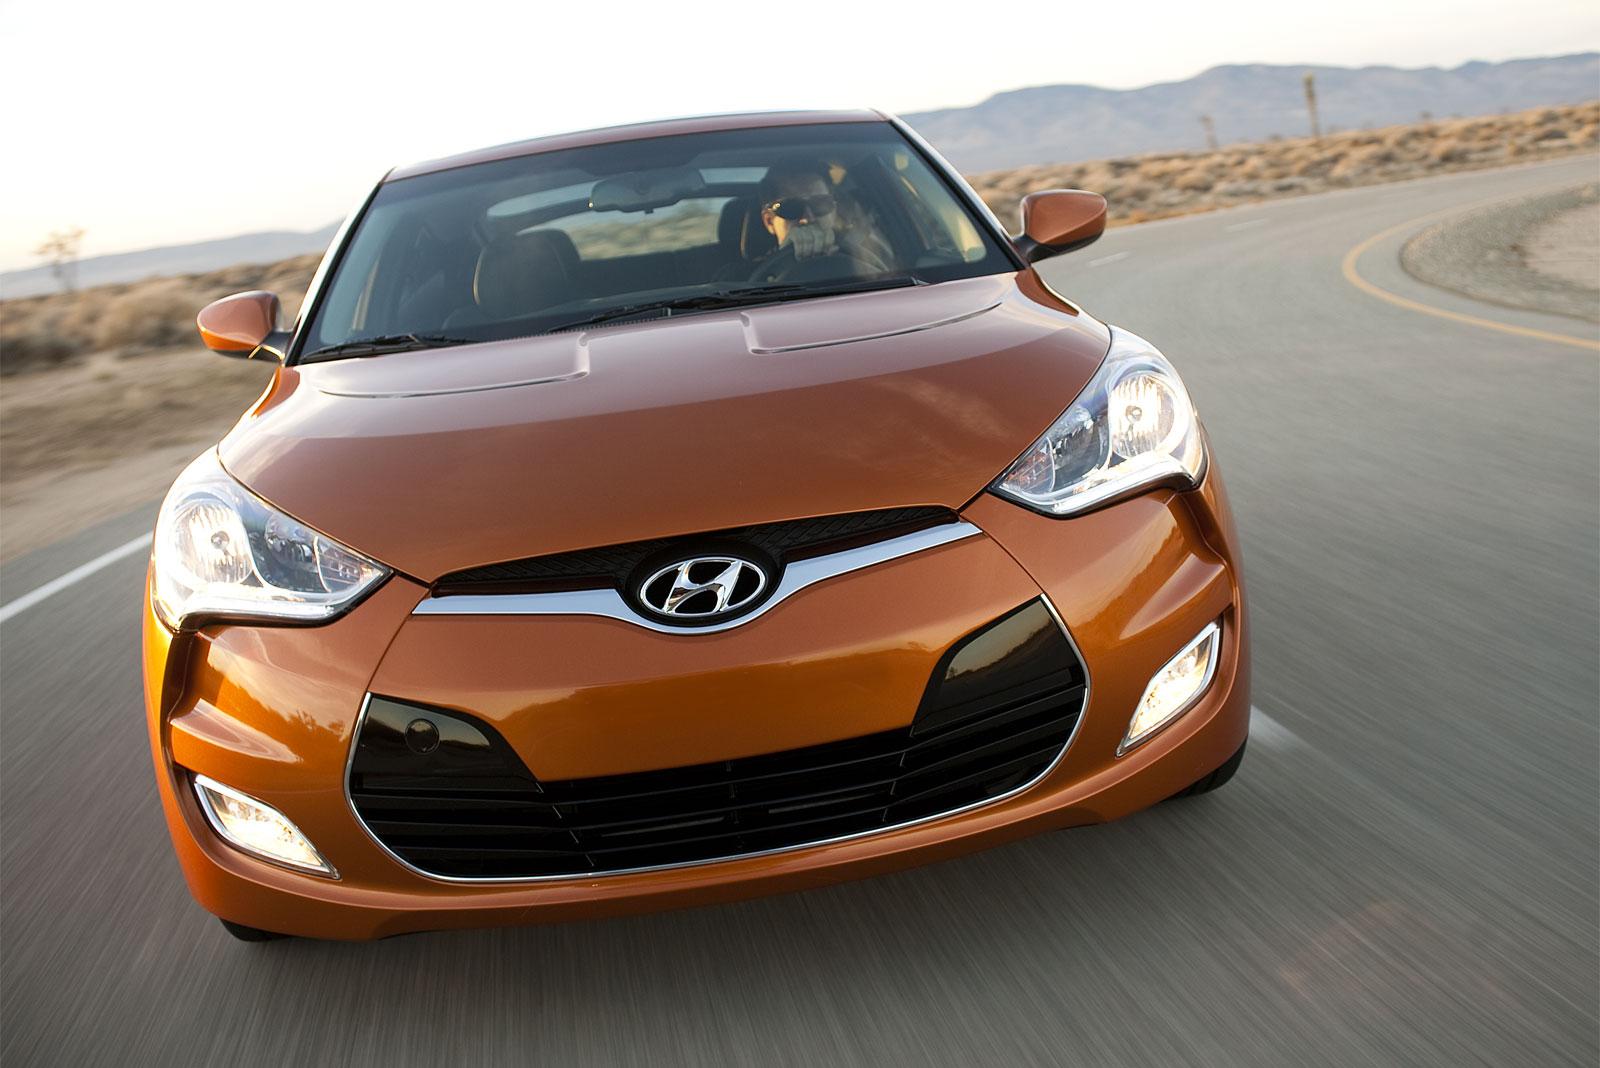 http://2.bp.blogspot.com/-g1TzjGZ4jeA/T-FdtLcOJwI/AAAAAAAADqY/eYe4i6pBcII/s1600/Hyundai+Veloster+hd+Wallpapers+2012_4.jpg